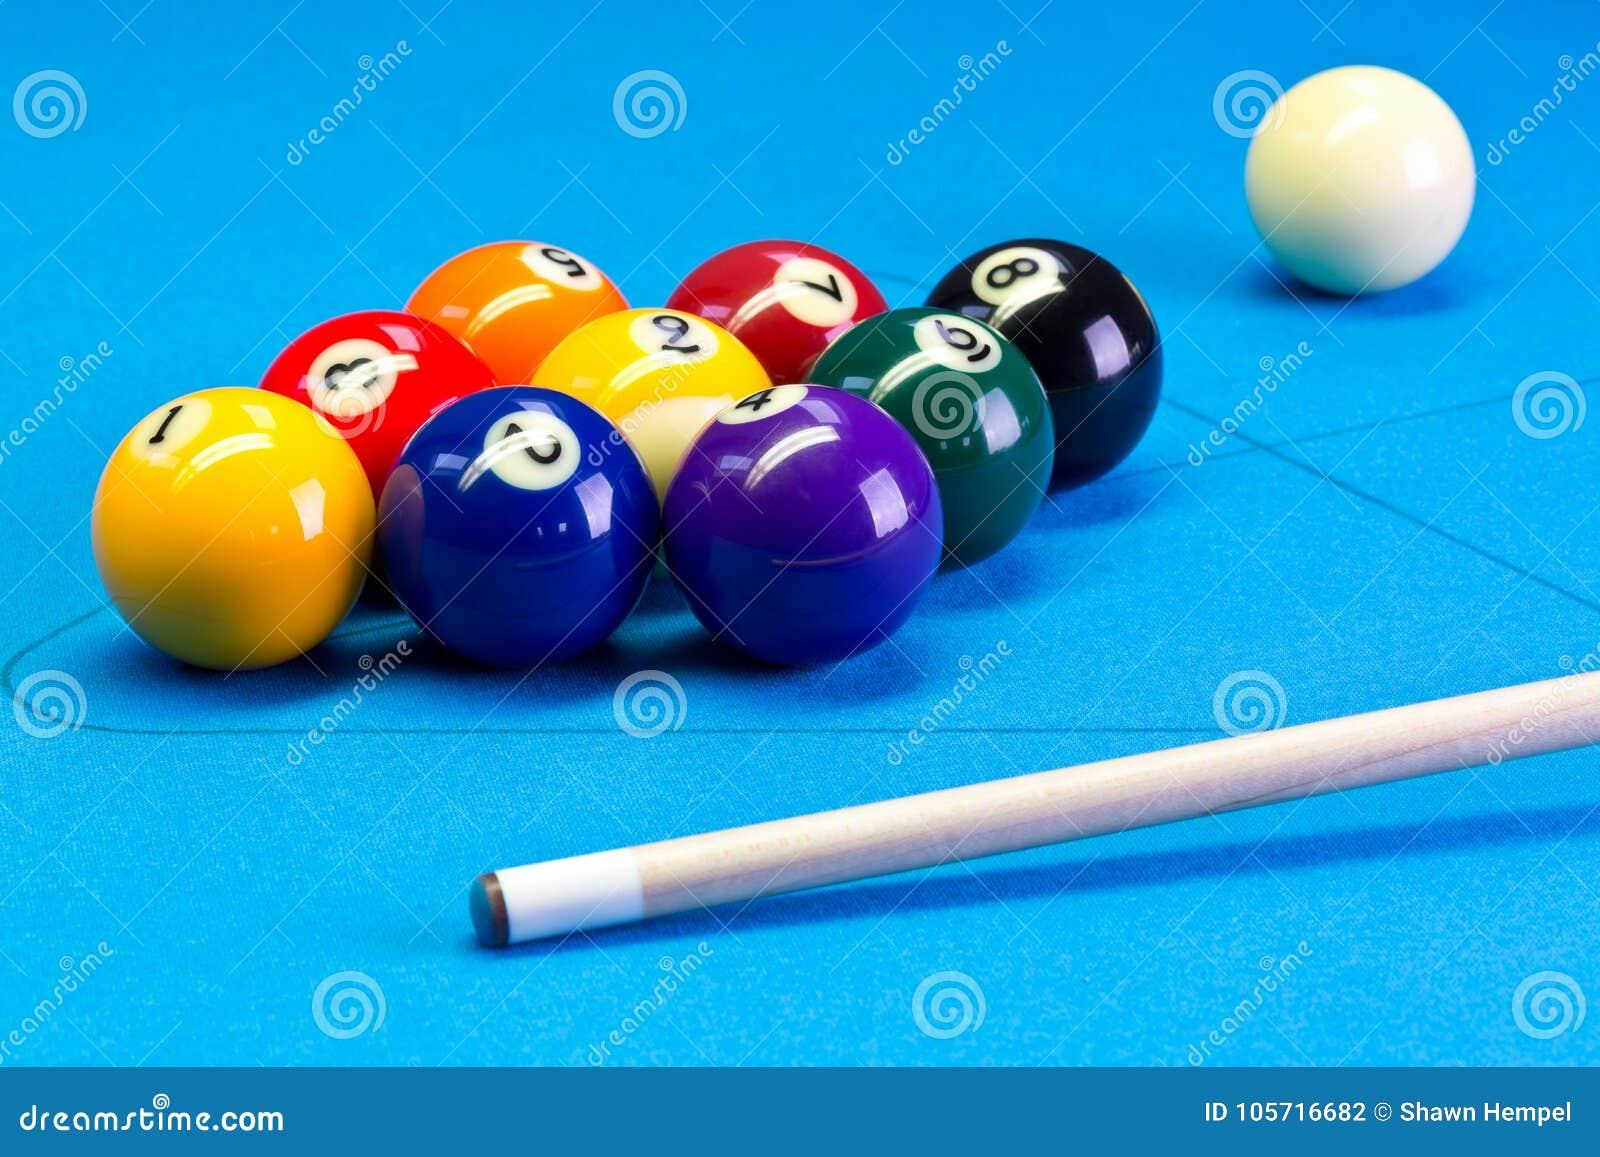 Pool Table Setup >> Billiard Pool Game Nine Ball Setup With Cue On Billiard